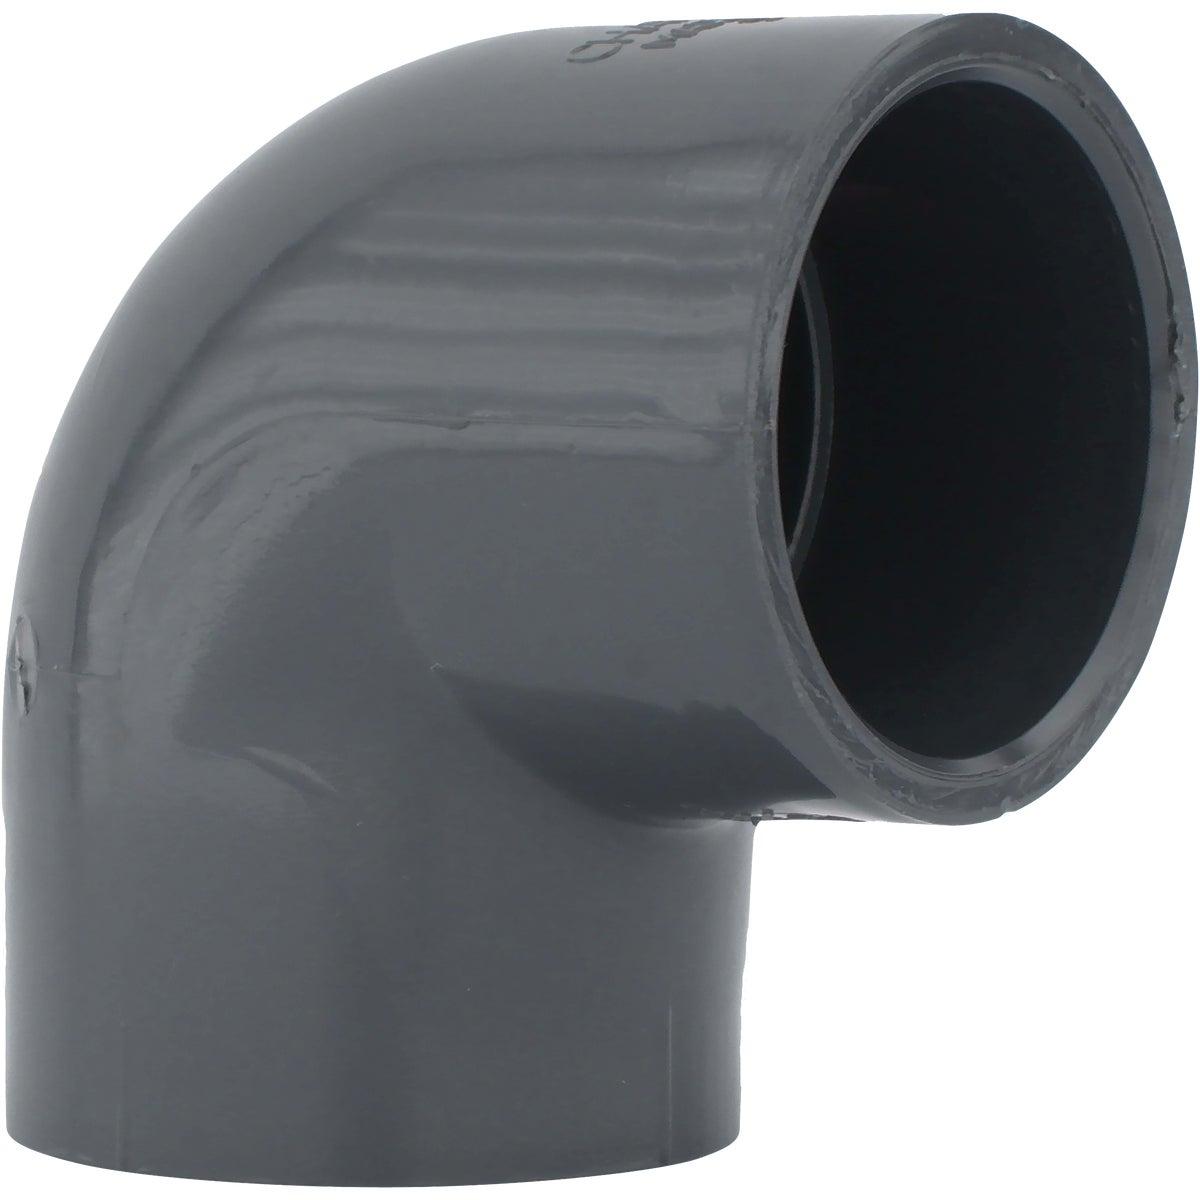 "2"" 90D SCH80 PVC ELBOW - 307208 by Genova Inc"